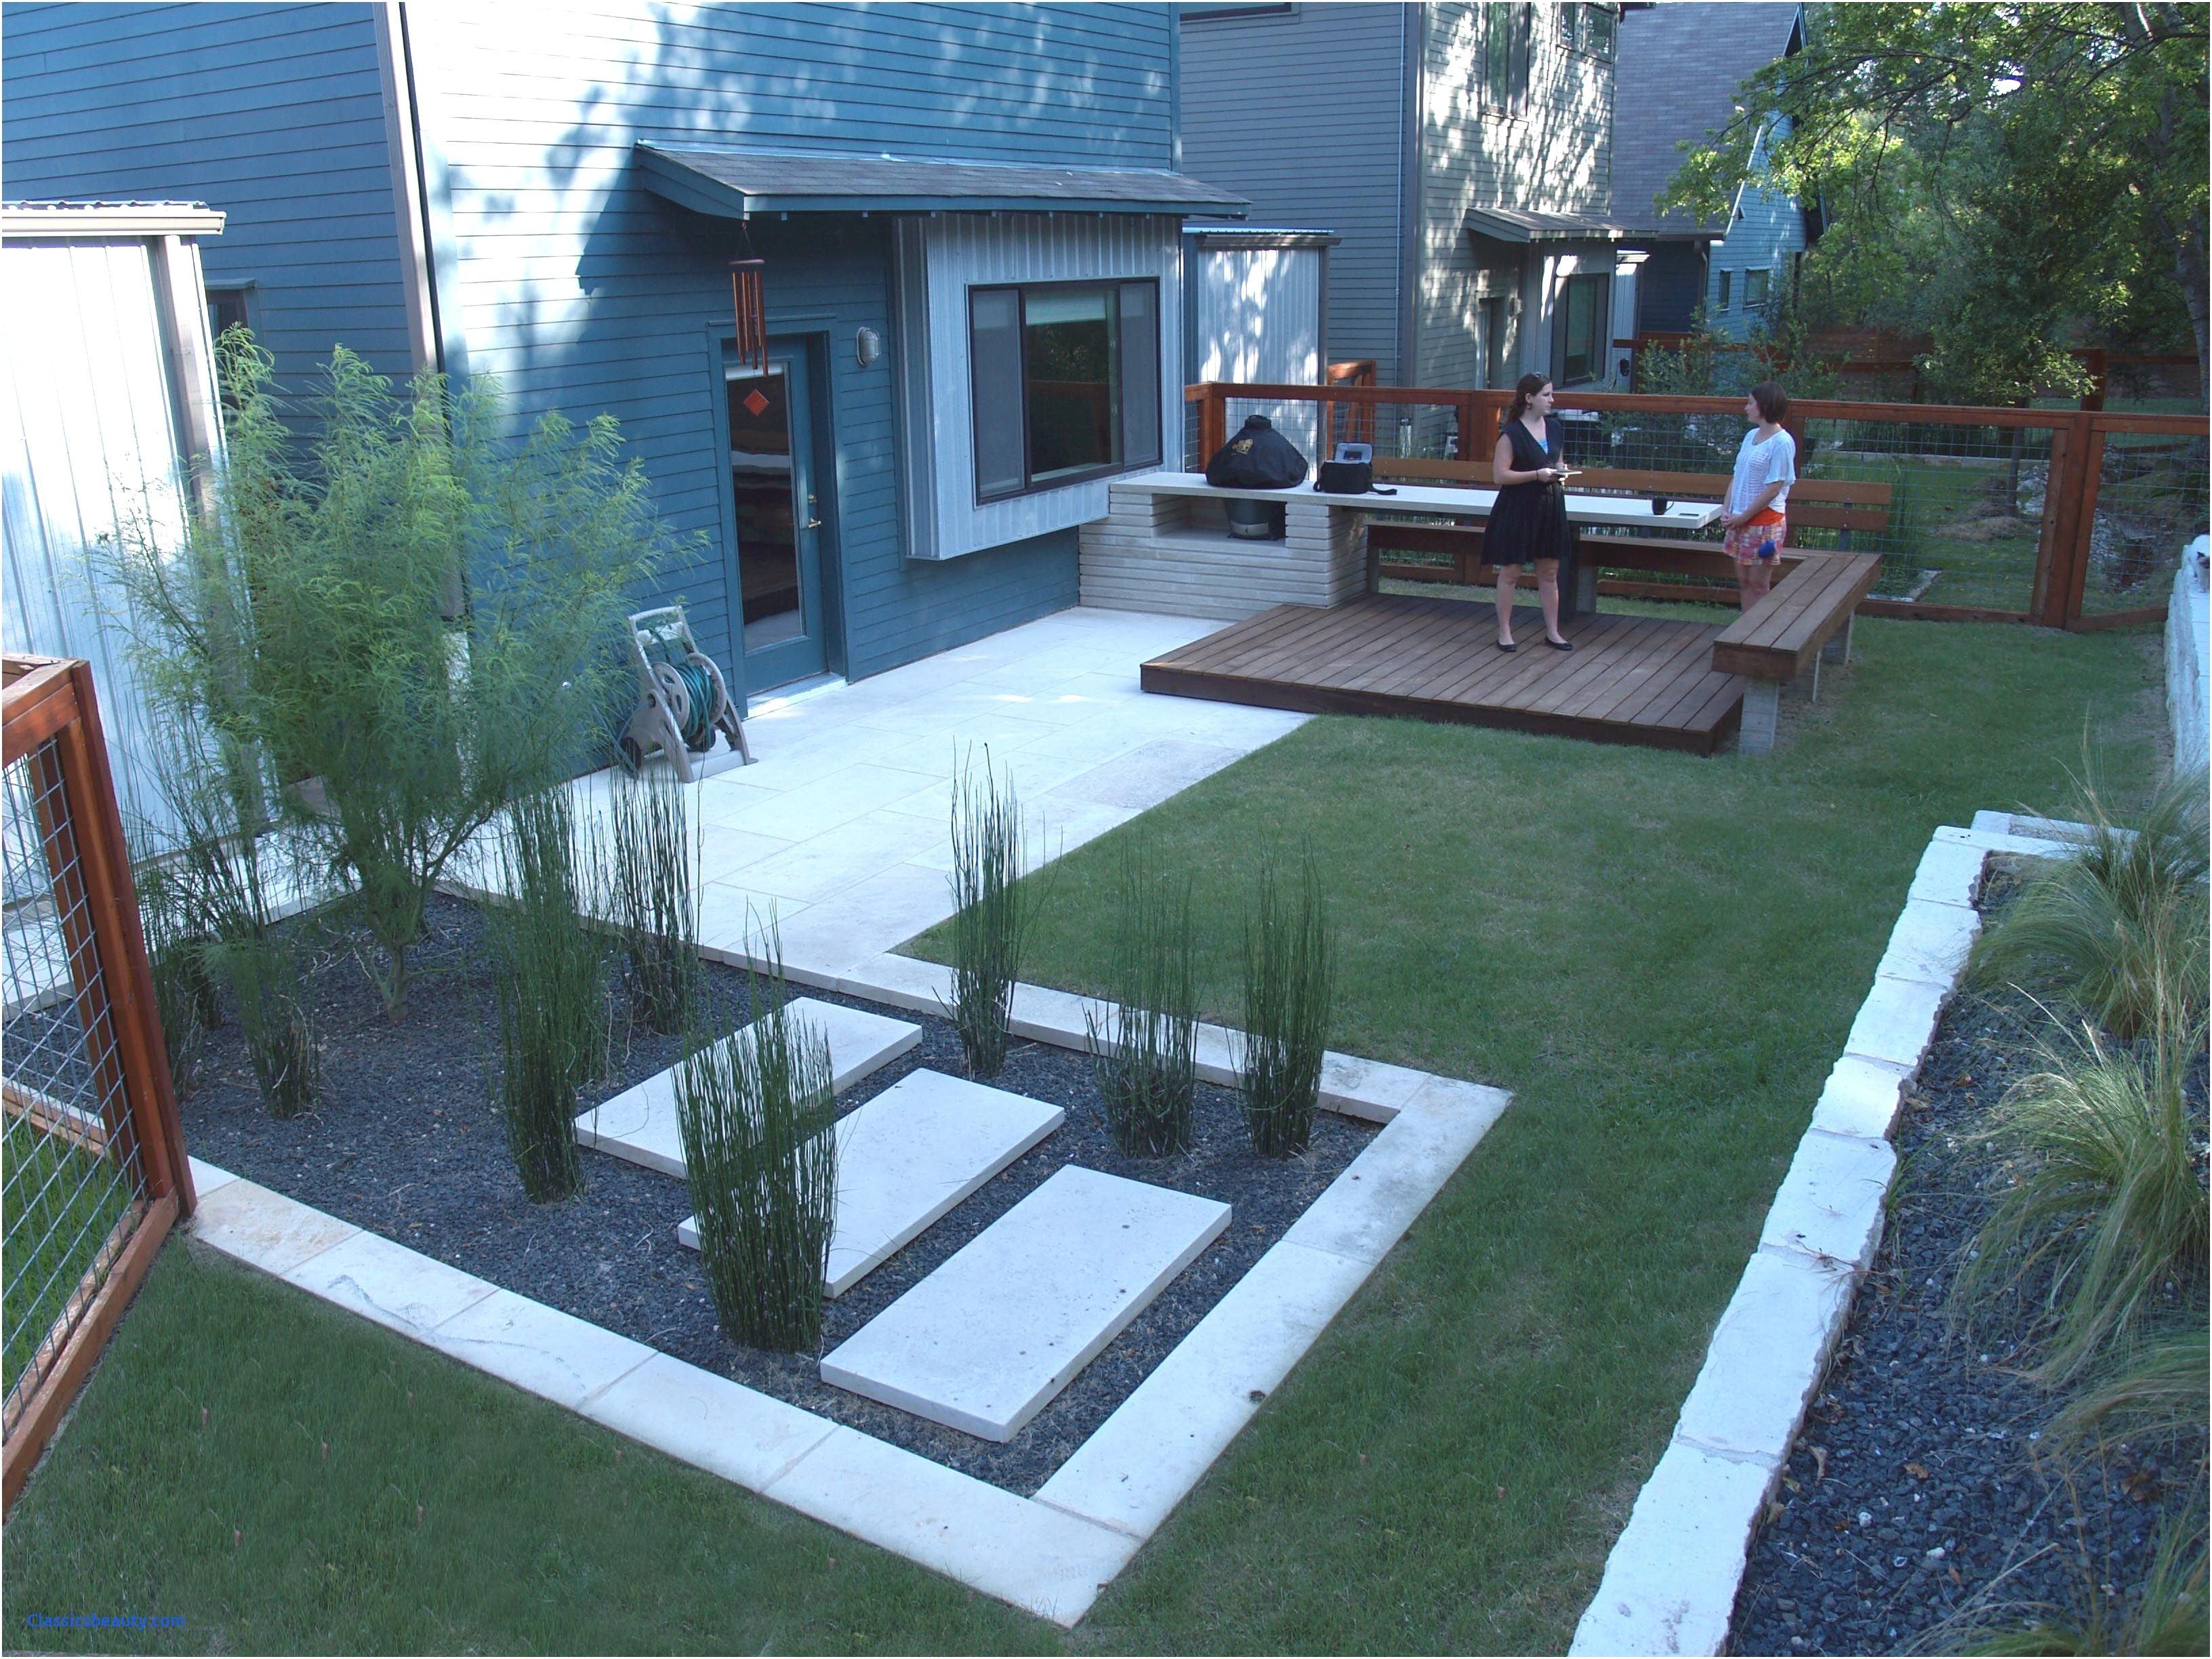 ... concrete patio ideas for small backyards ... RBHQJRO